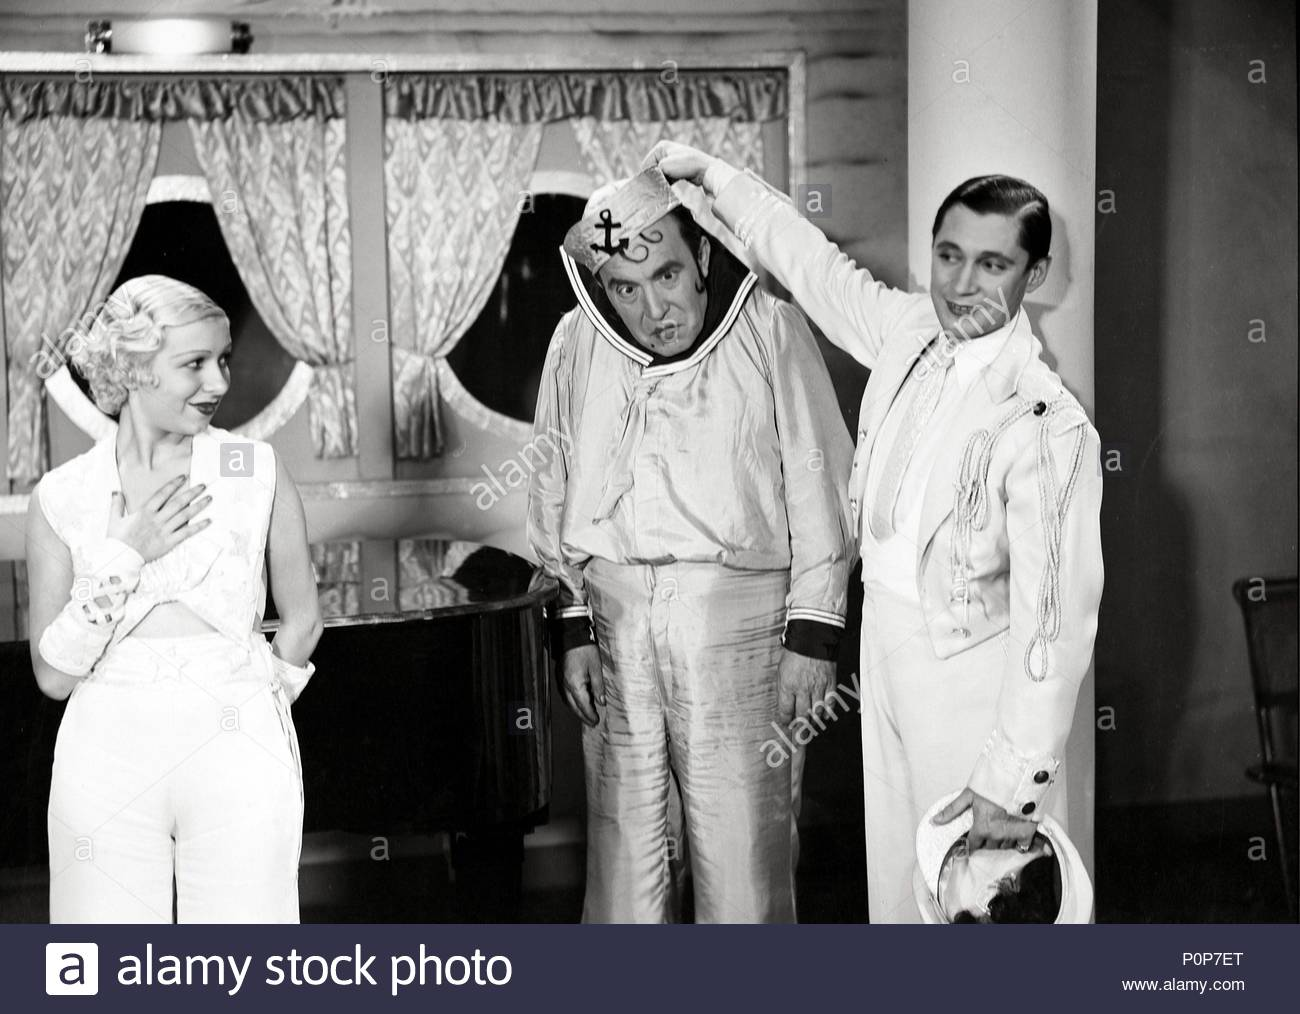 Original Film Title: ABAJO LOS HOMBRES.  English Title: ABAJO LOS HOMBRES.  Film Director: JOSE MARIA CASTELLVI.  Year: 1935.  Stars: CARMELITA AUBERT; ALEJANDRO NOLLA; PIERRE CLAREL. Credit: EDICI / Album - Stock Image